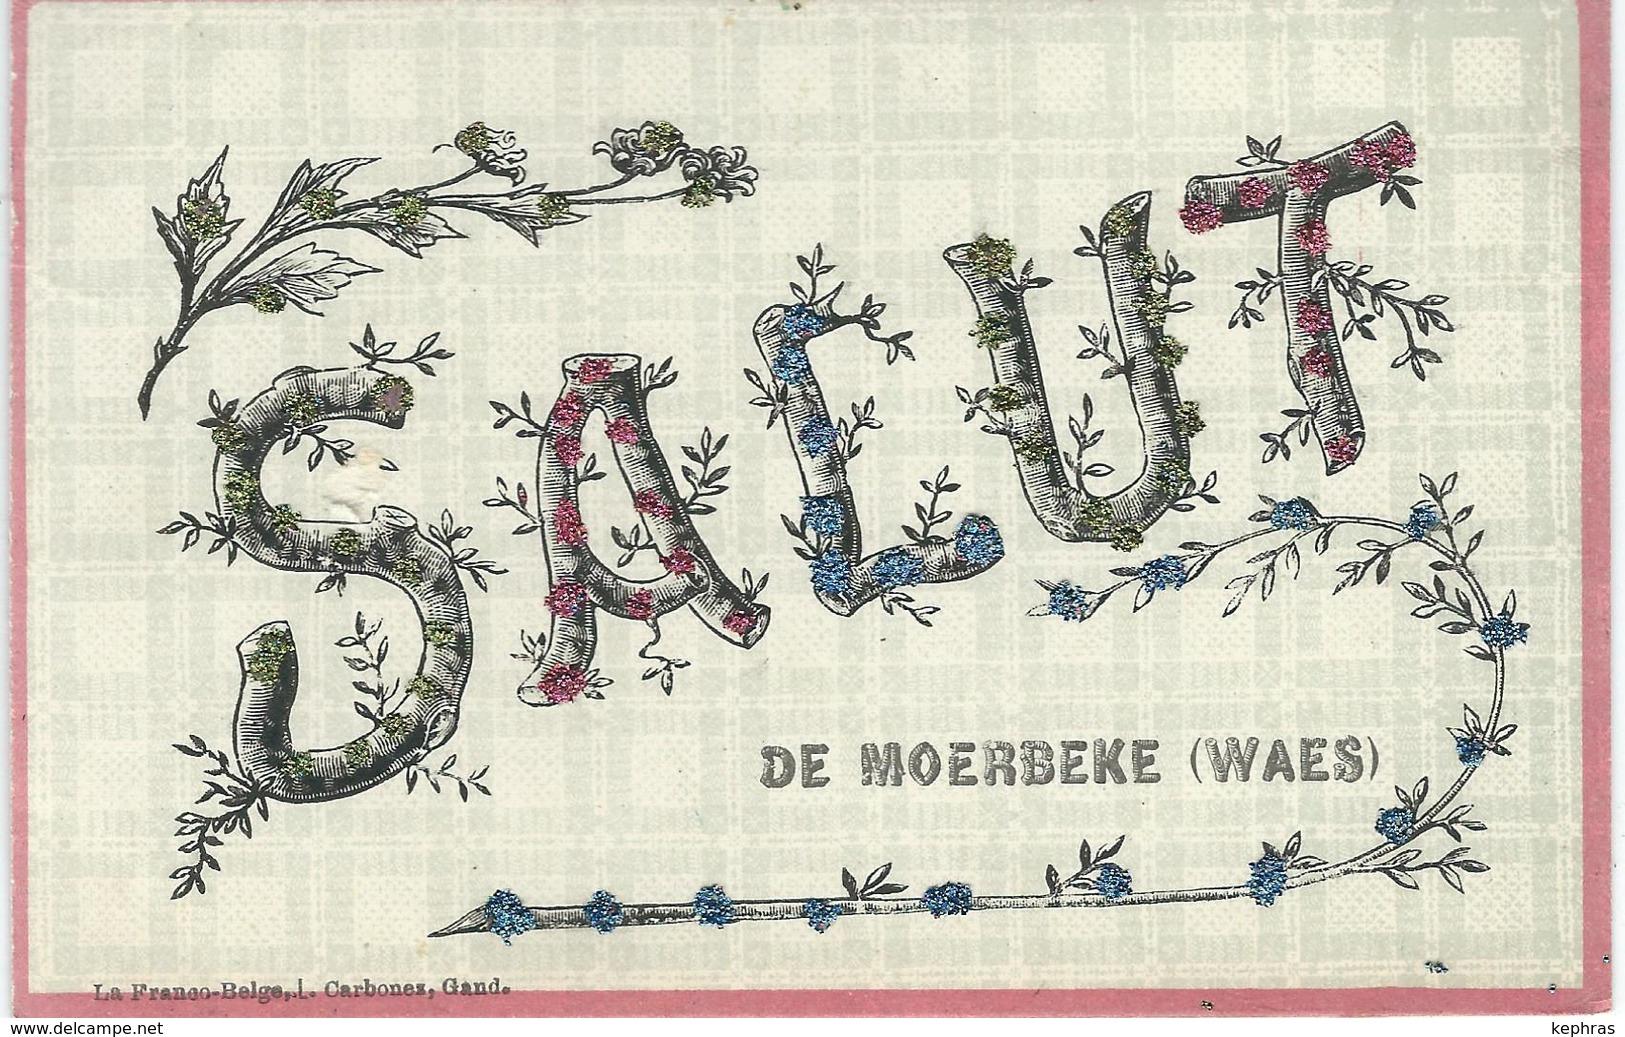 Salut De MOERBEKE Waes - Cachet De La Poste 1906 - Moerbeke-Waas